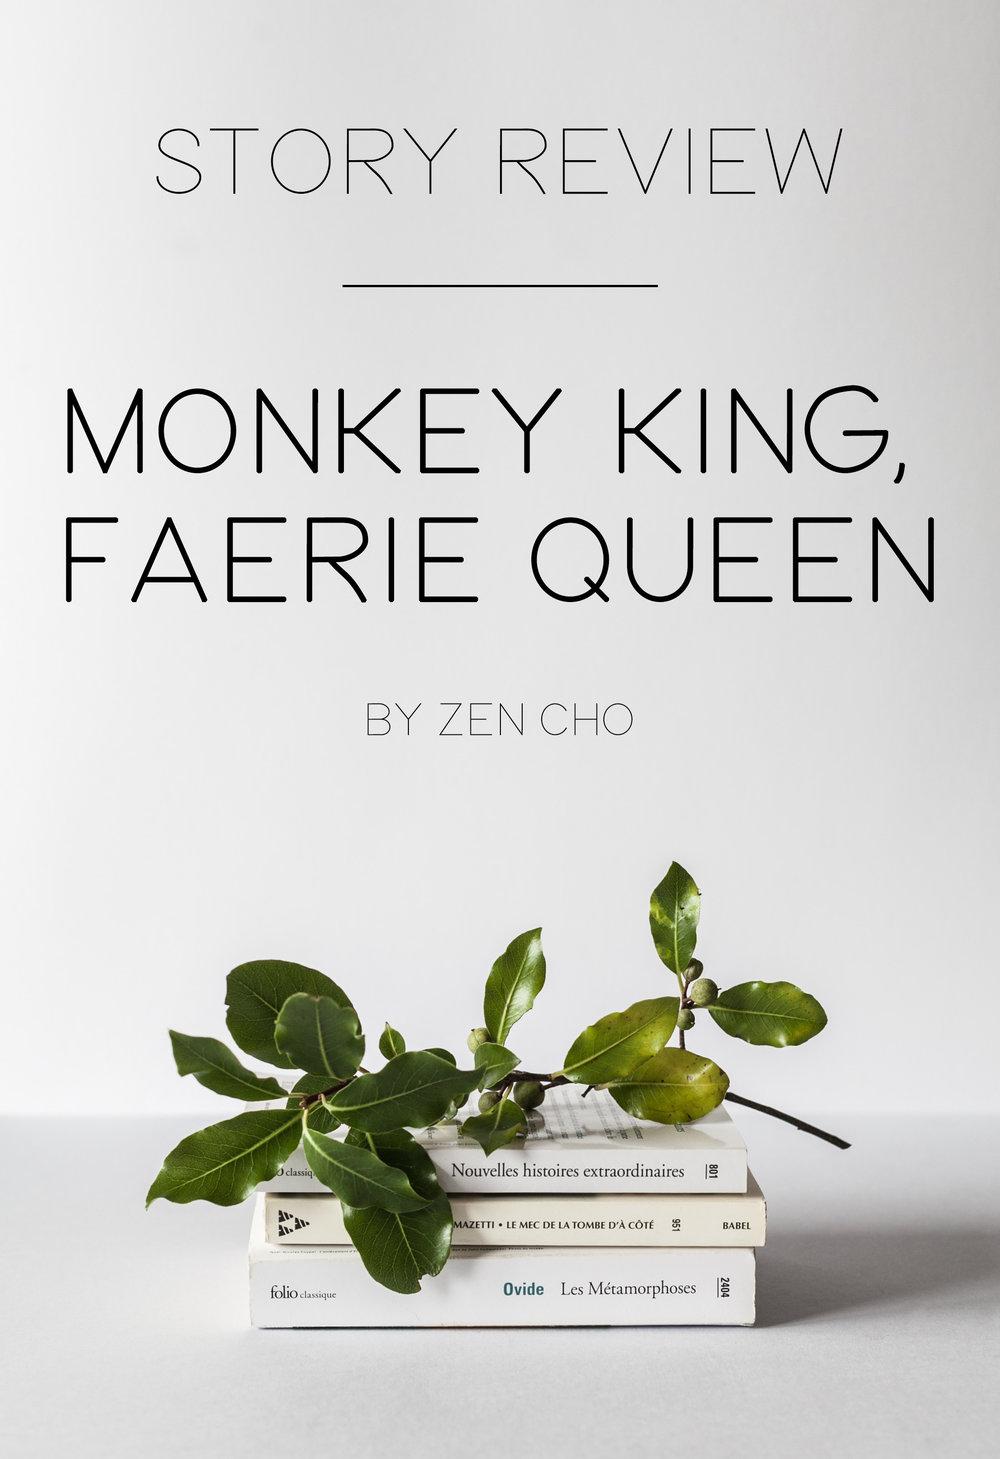 book review header template-monkeyking.jpg